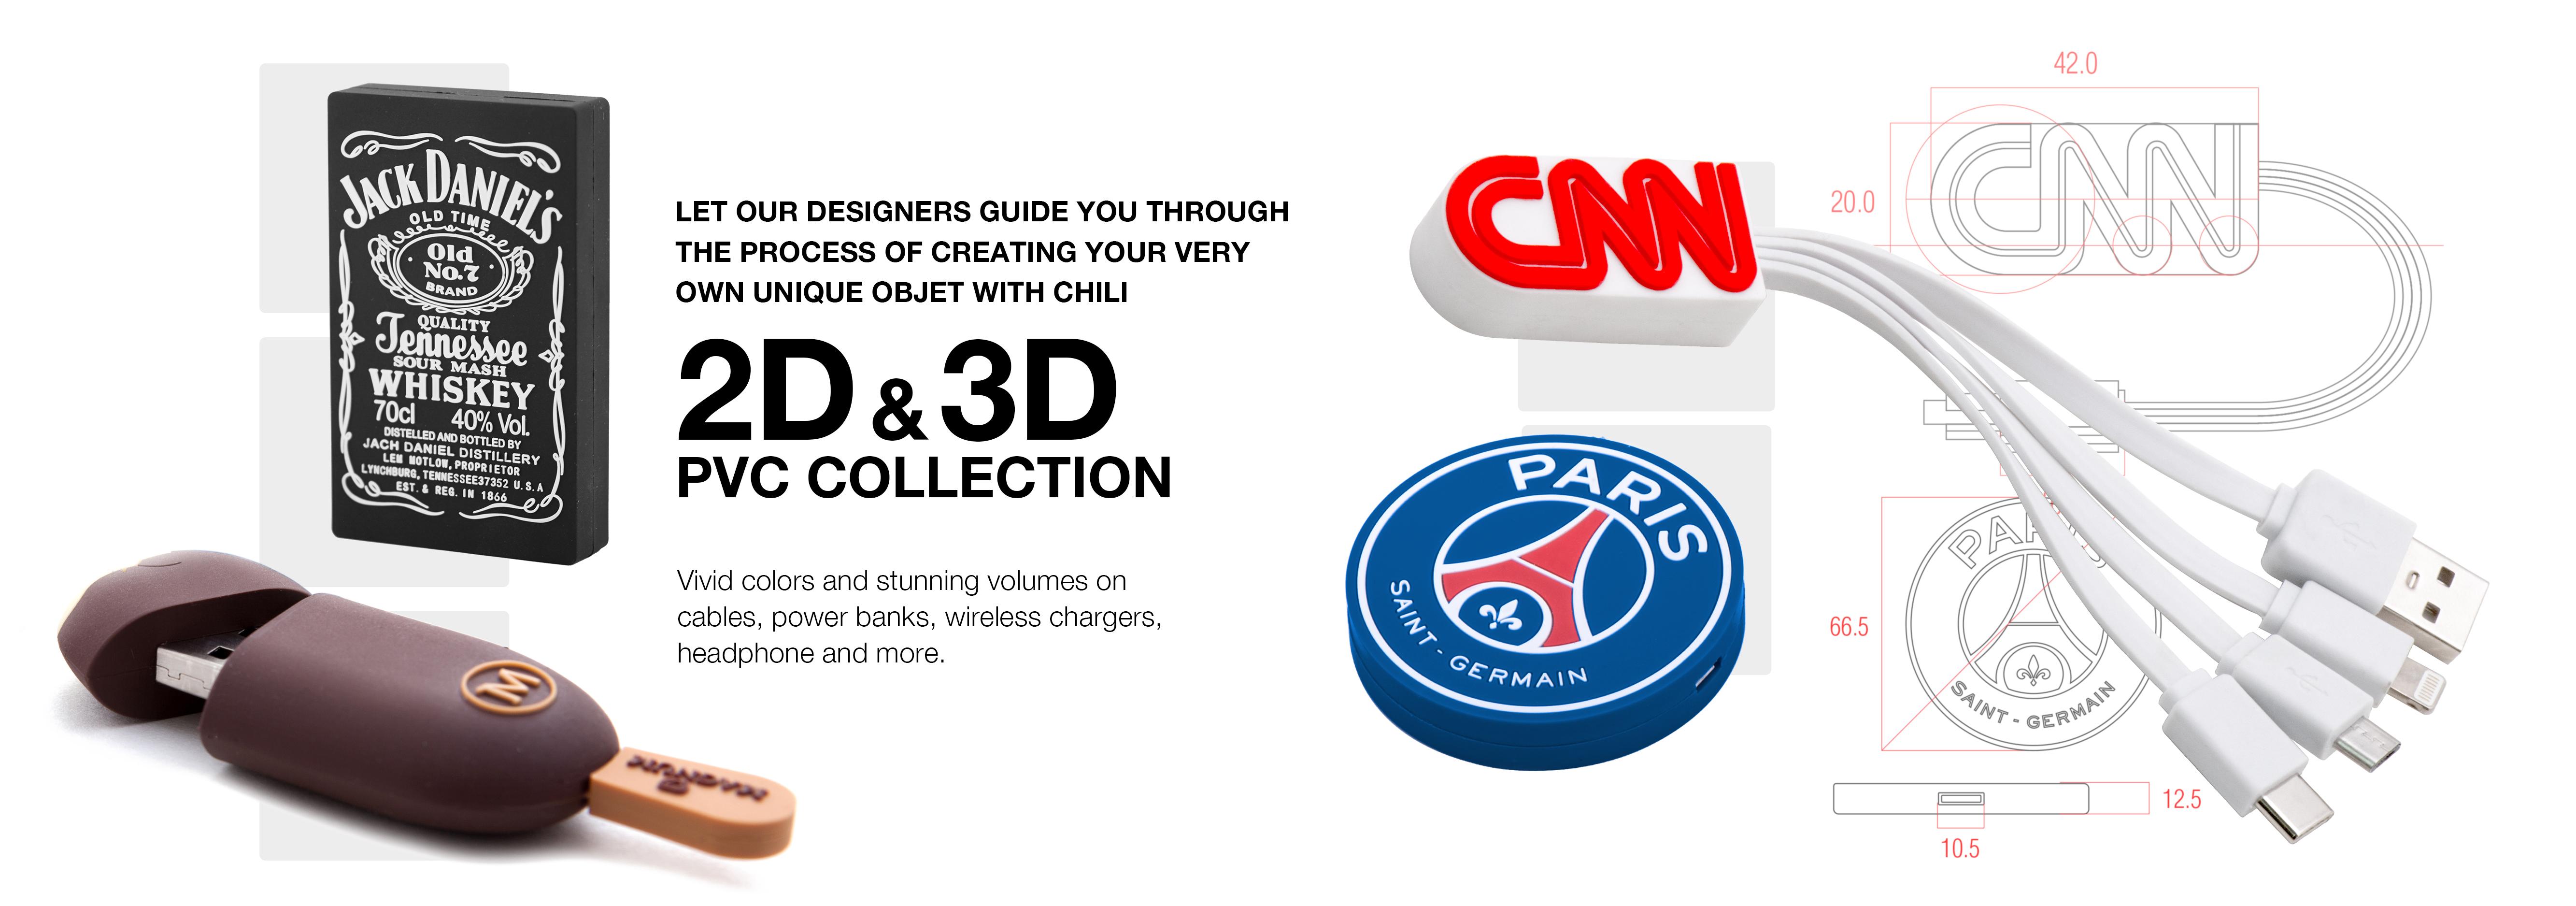 2D & 3D PVC PROGRAMS